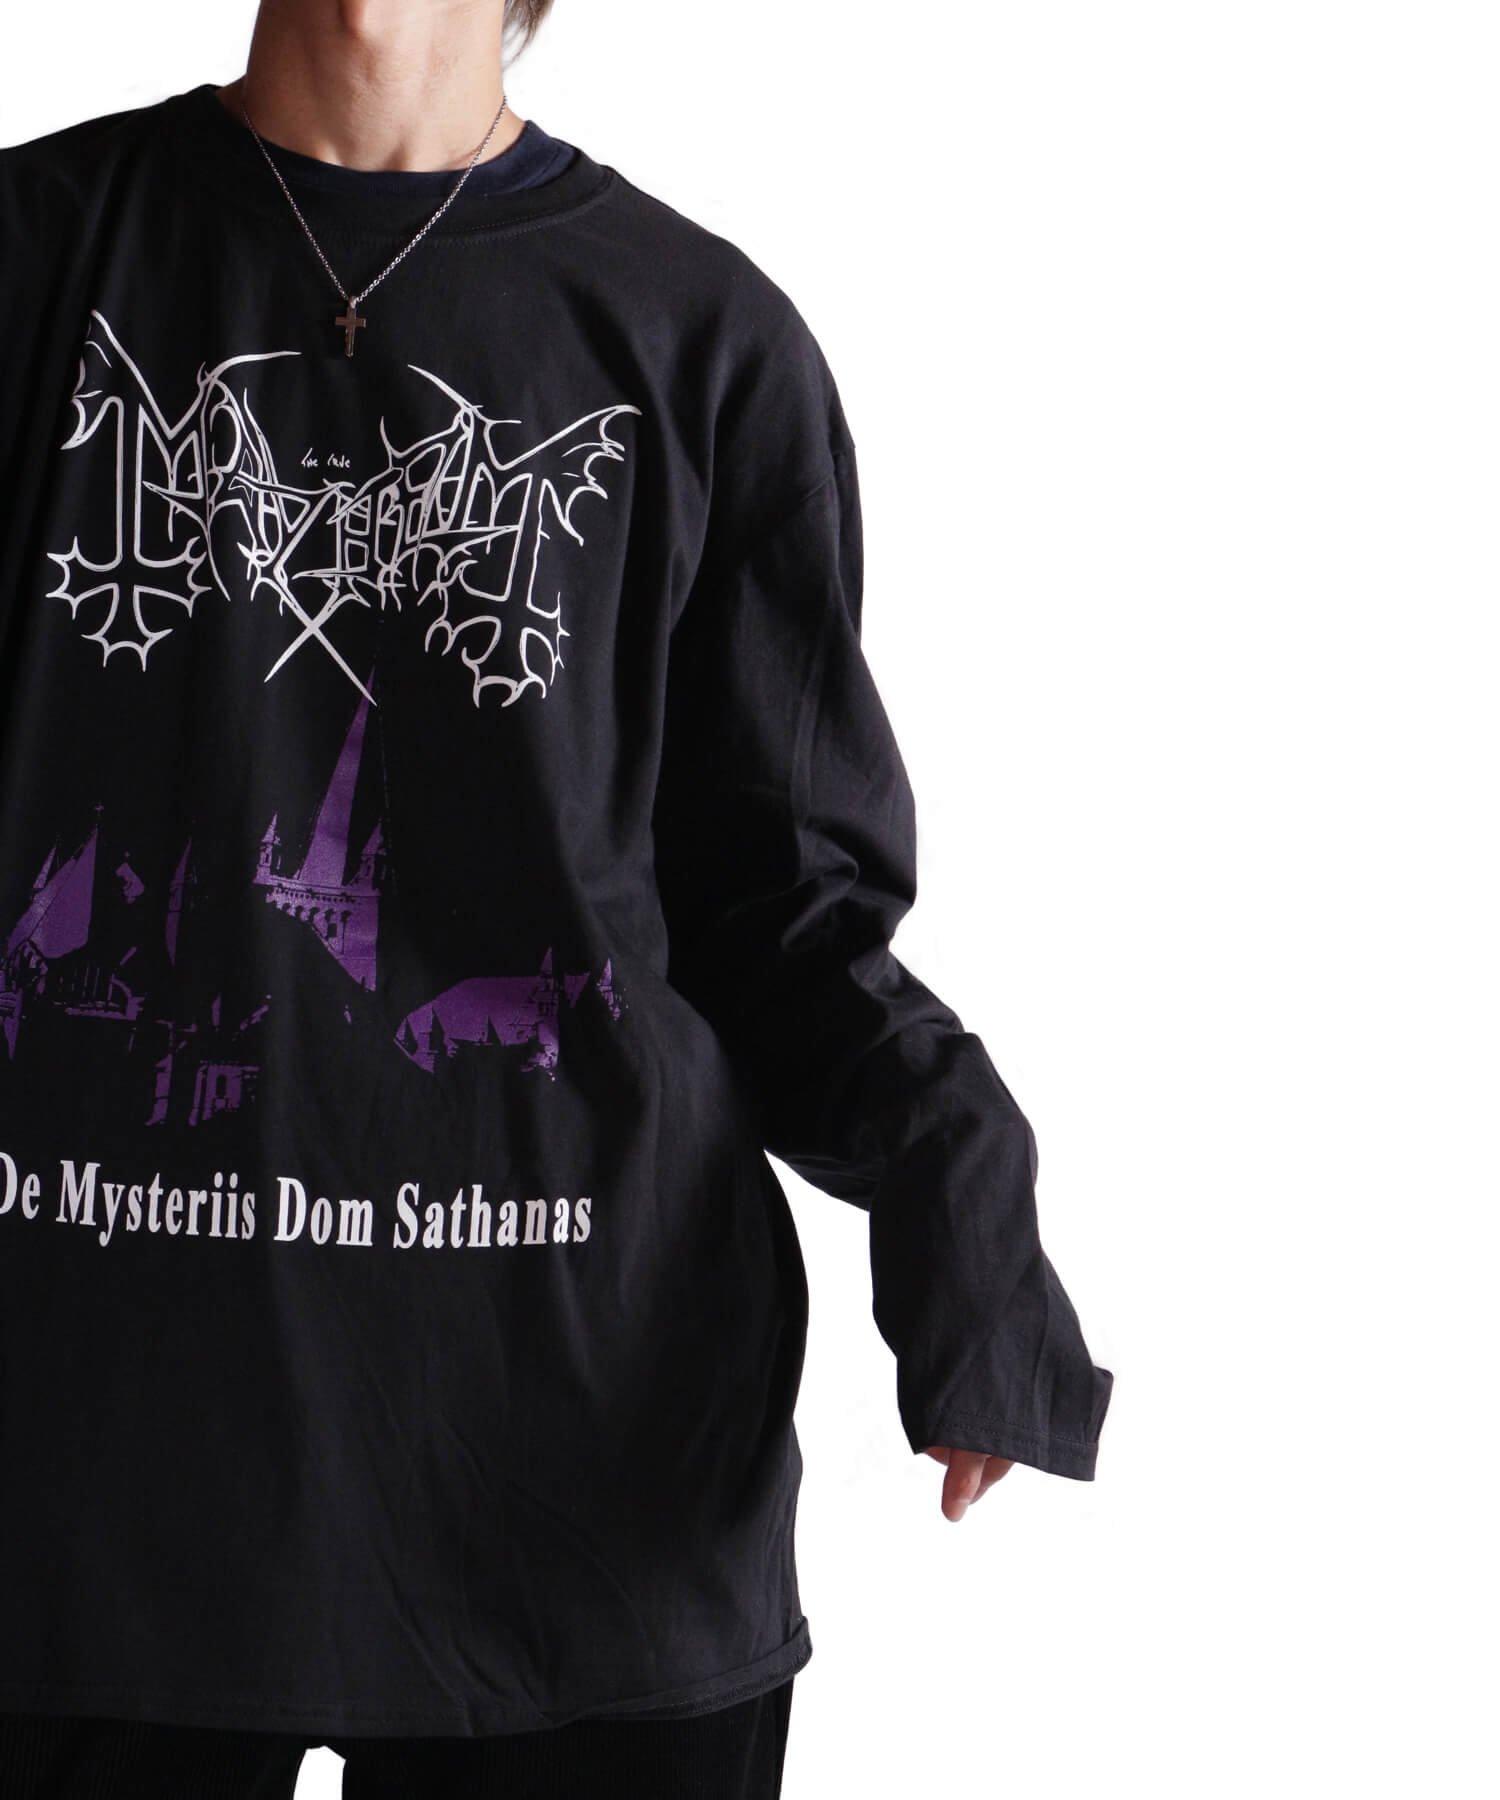 Official Artist Goods / バンドTなど |MAYHEM / メイヘム:DE MYSTERIIS DOM SATHANAS LONG SLEEVE SHIRT (BLACK) 商品画像15